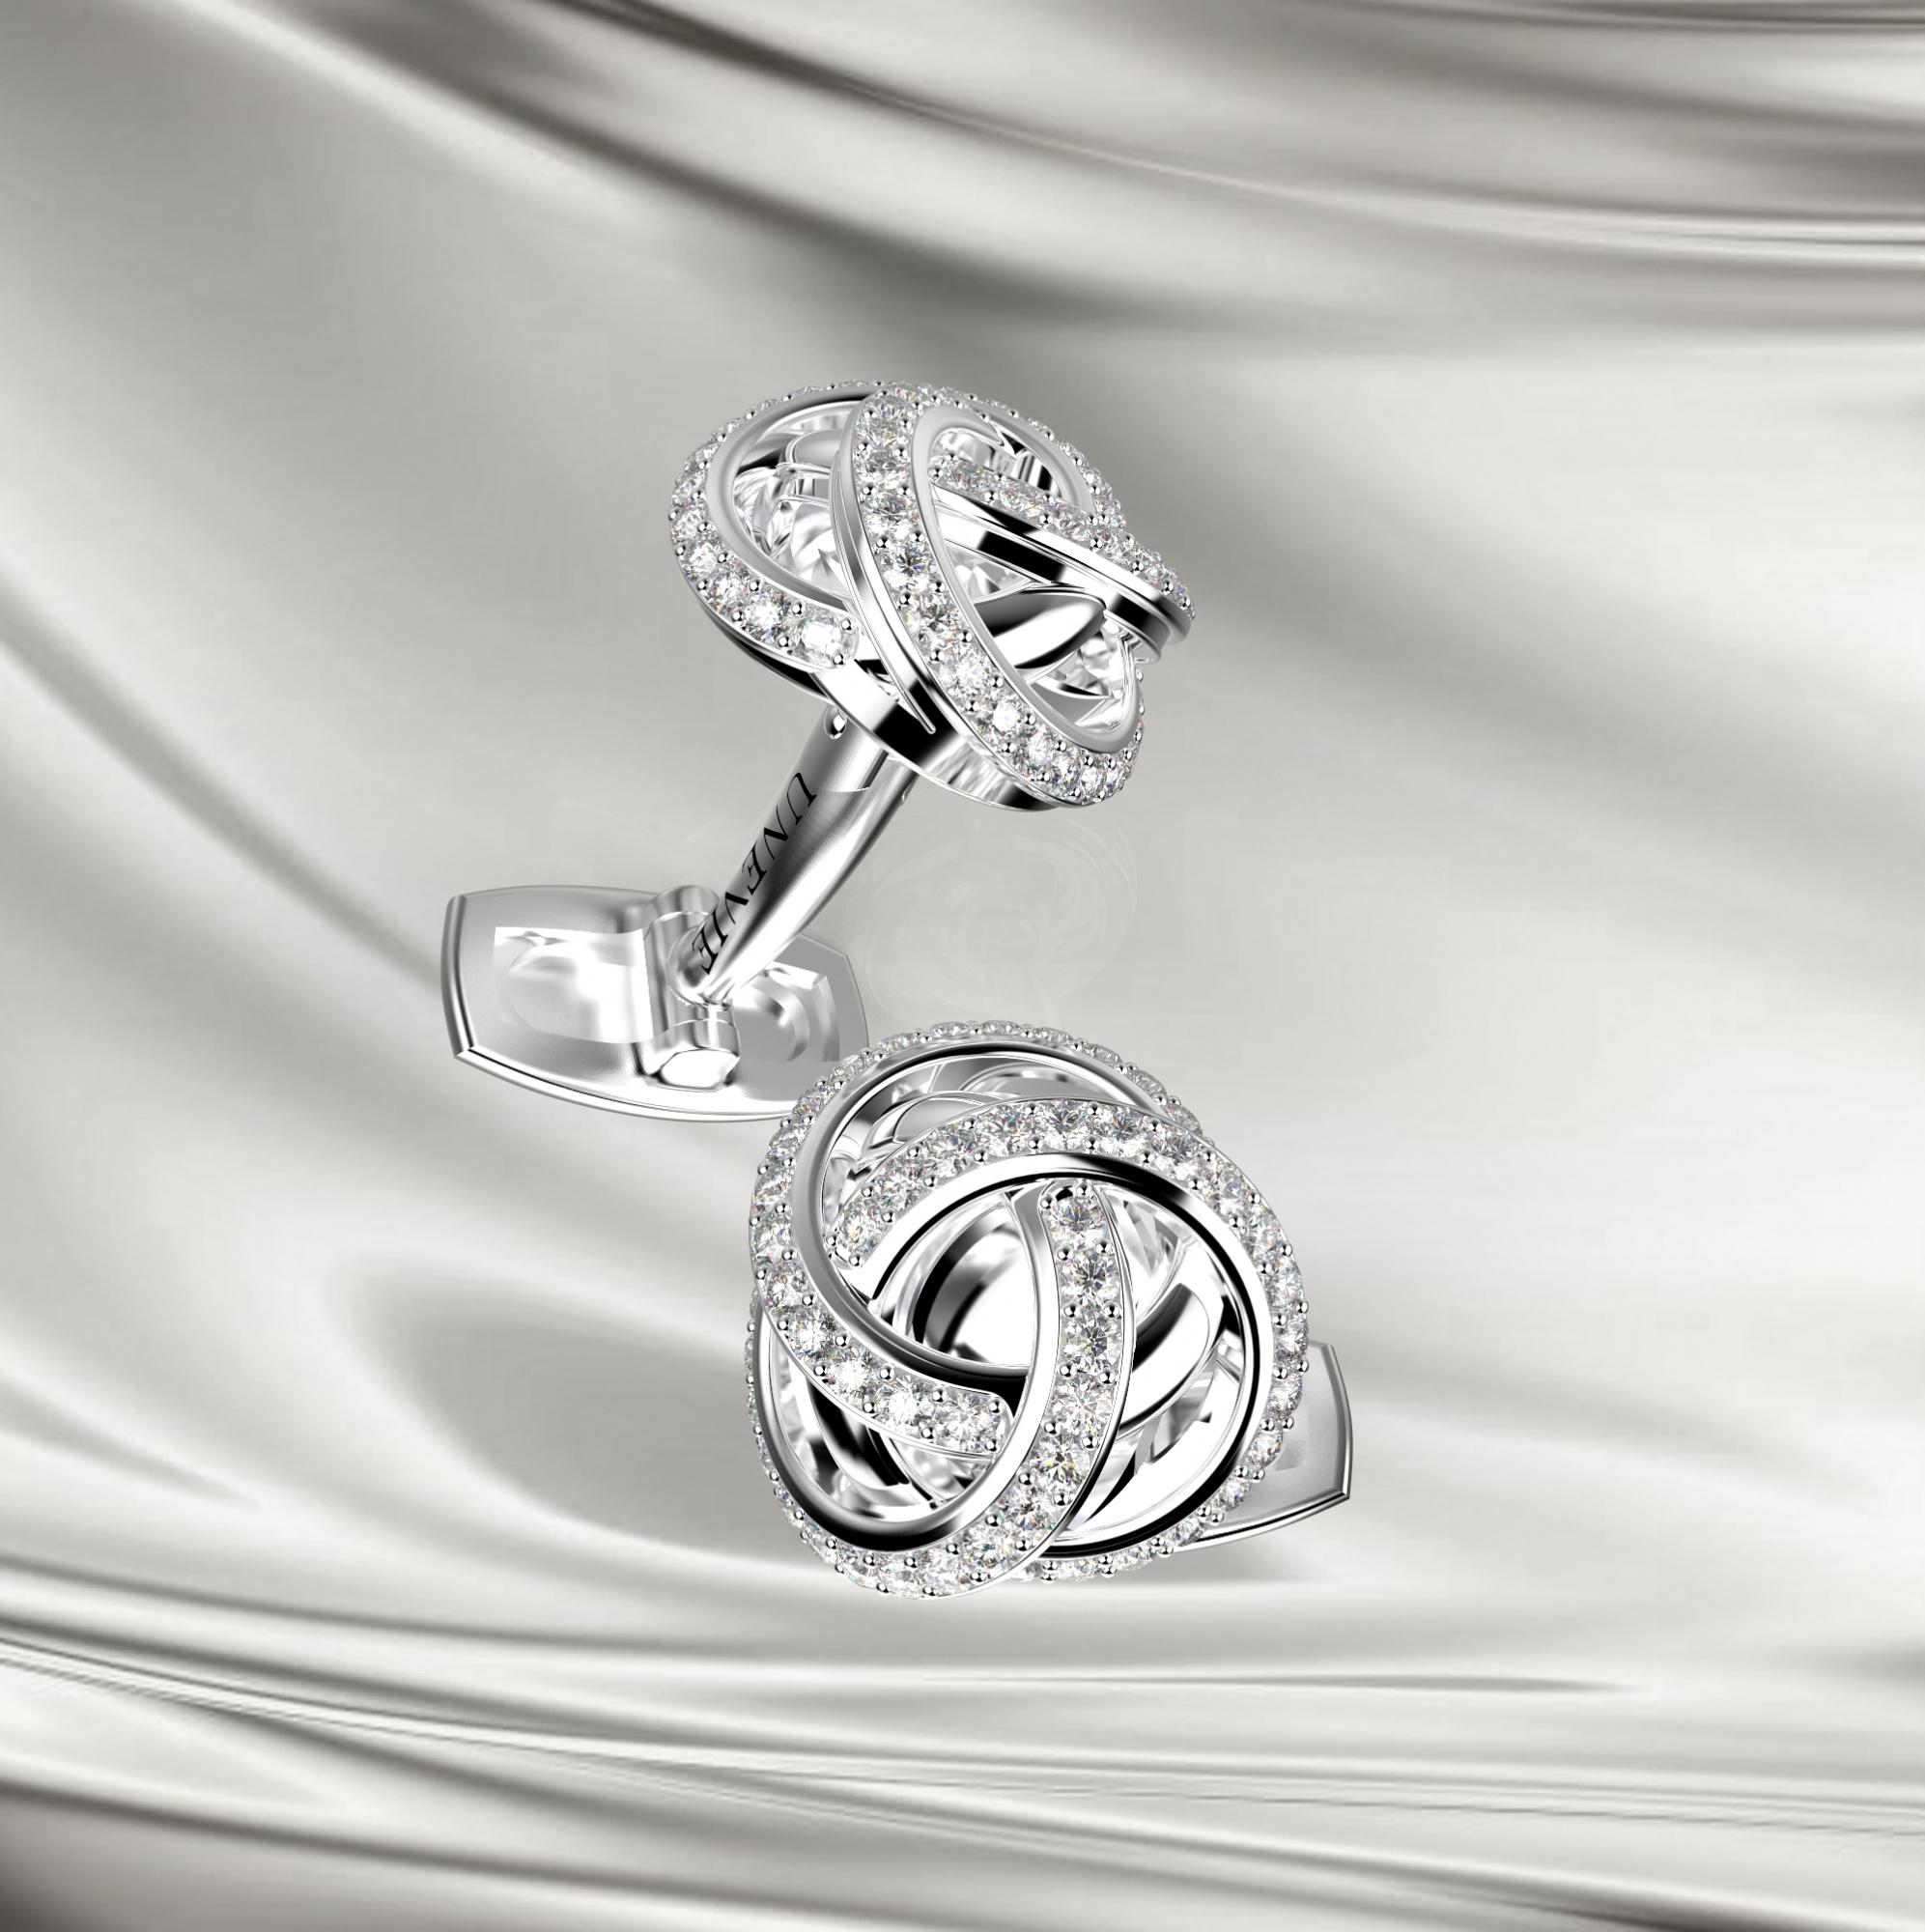 М14 Запонки из белого золота с бриллиантами